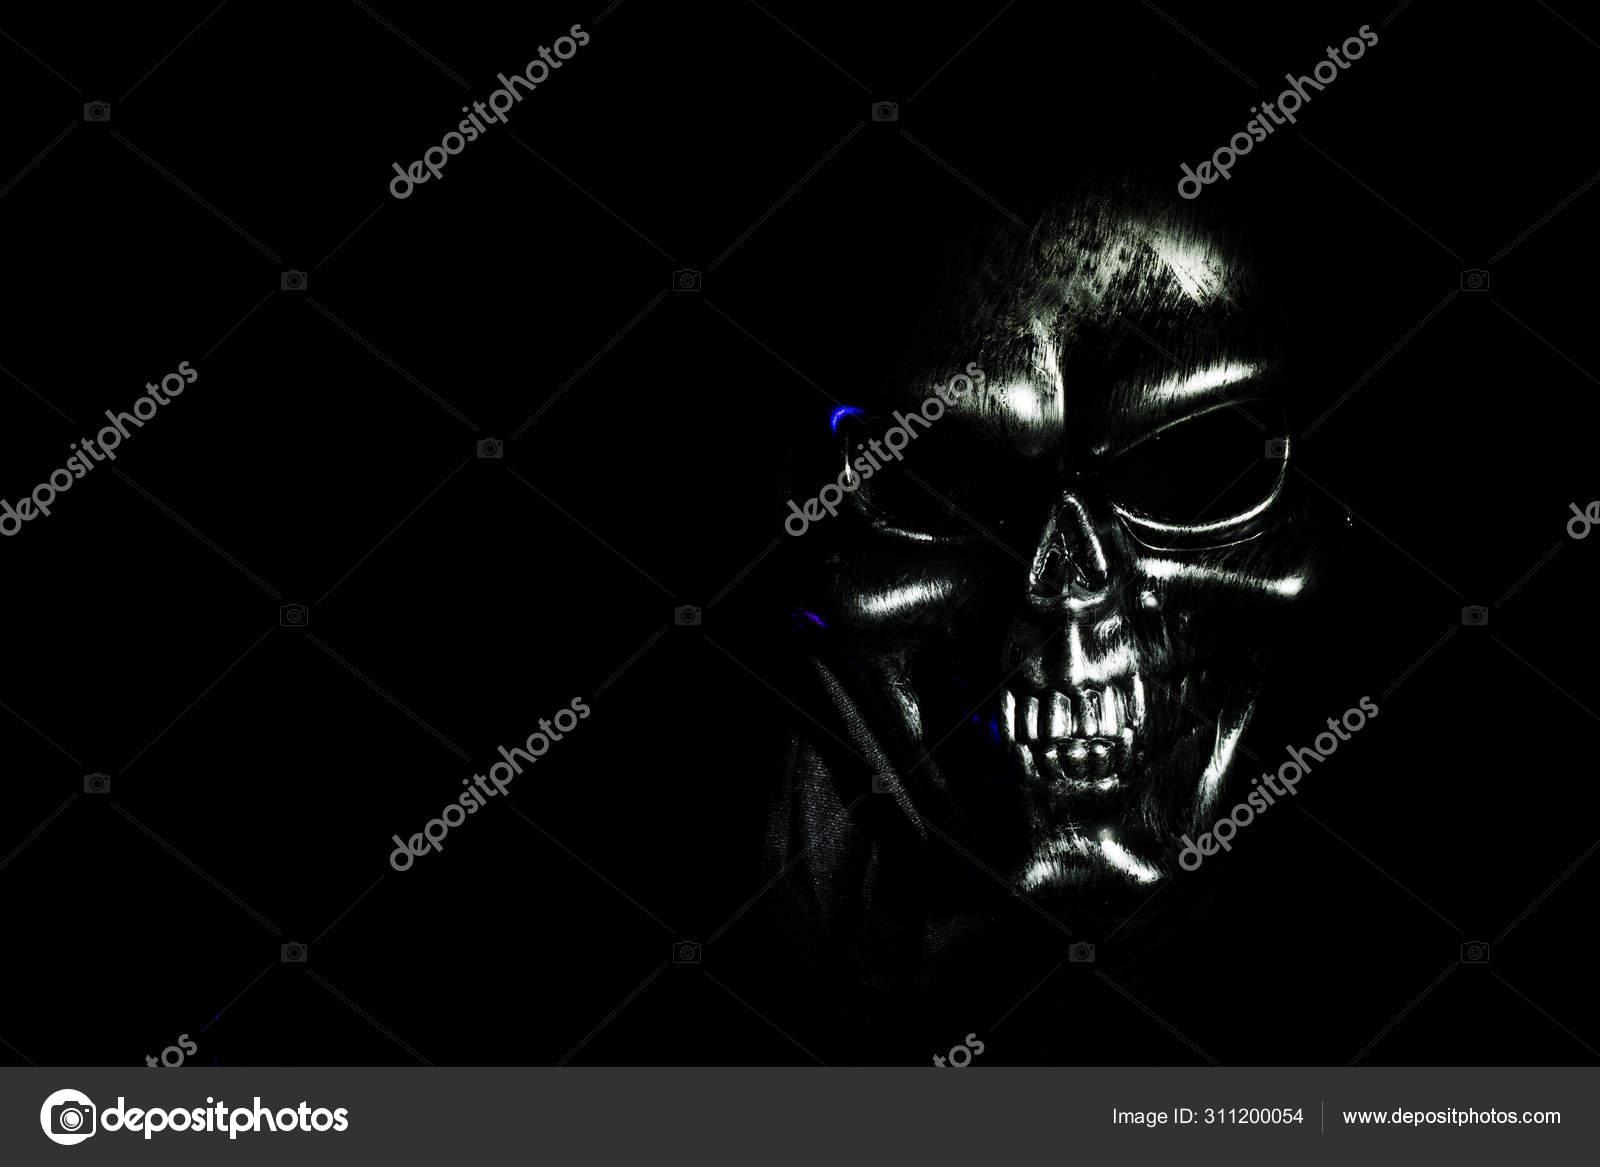 Scary Skul On Black Background Selective Focus Scary Grunge Skull Wallpaper Halloween Background Stock Photo C Nimfafora Photo 311200054